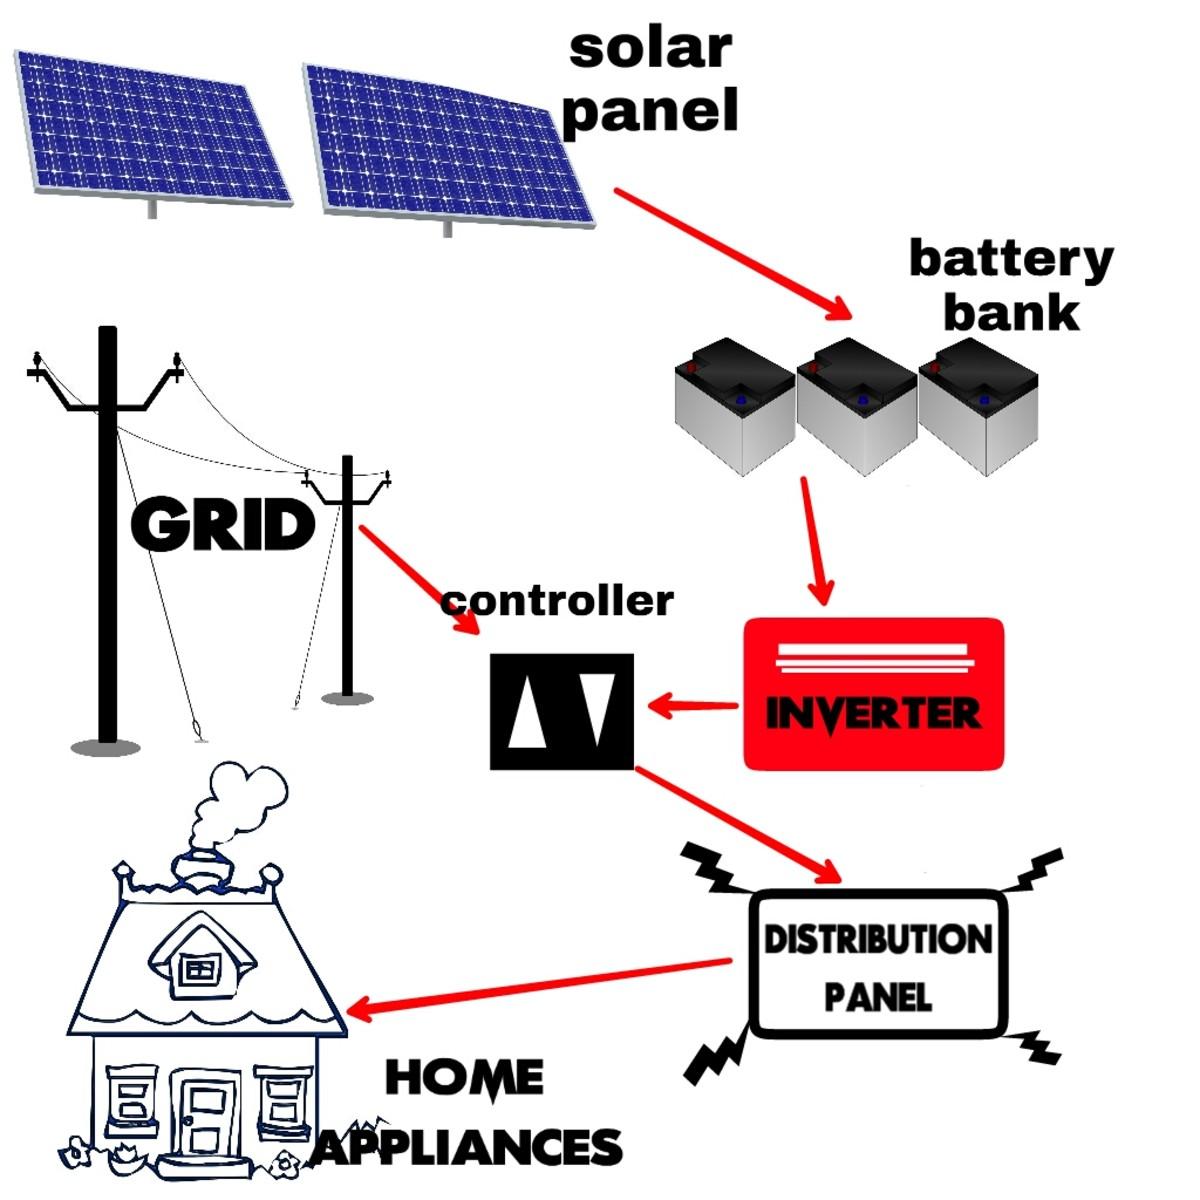 Simplified model of a Grid-fallback solar power system